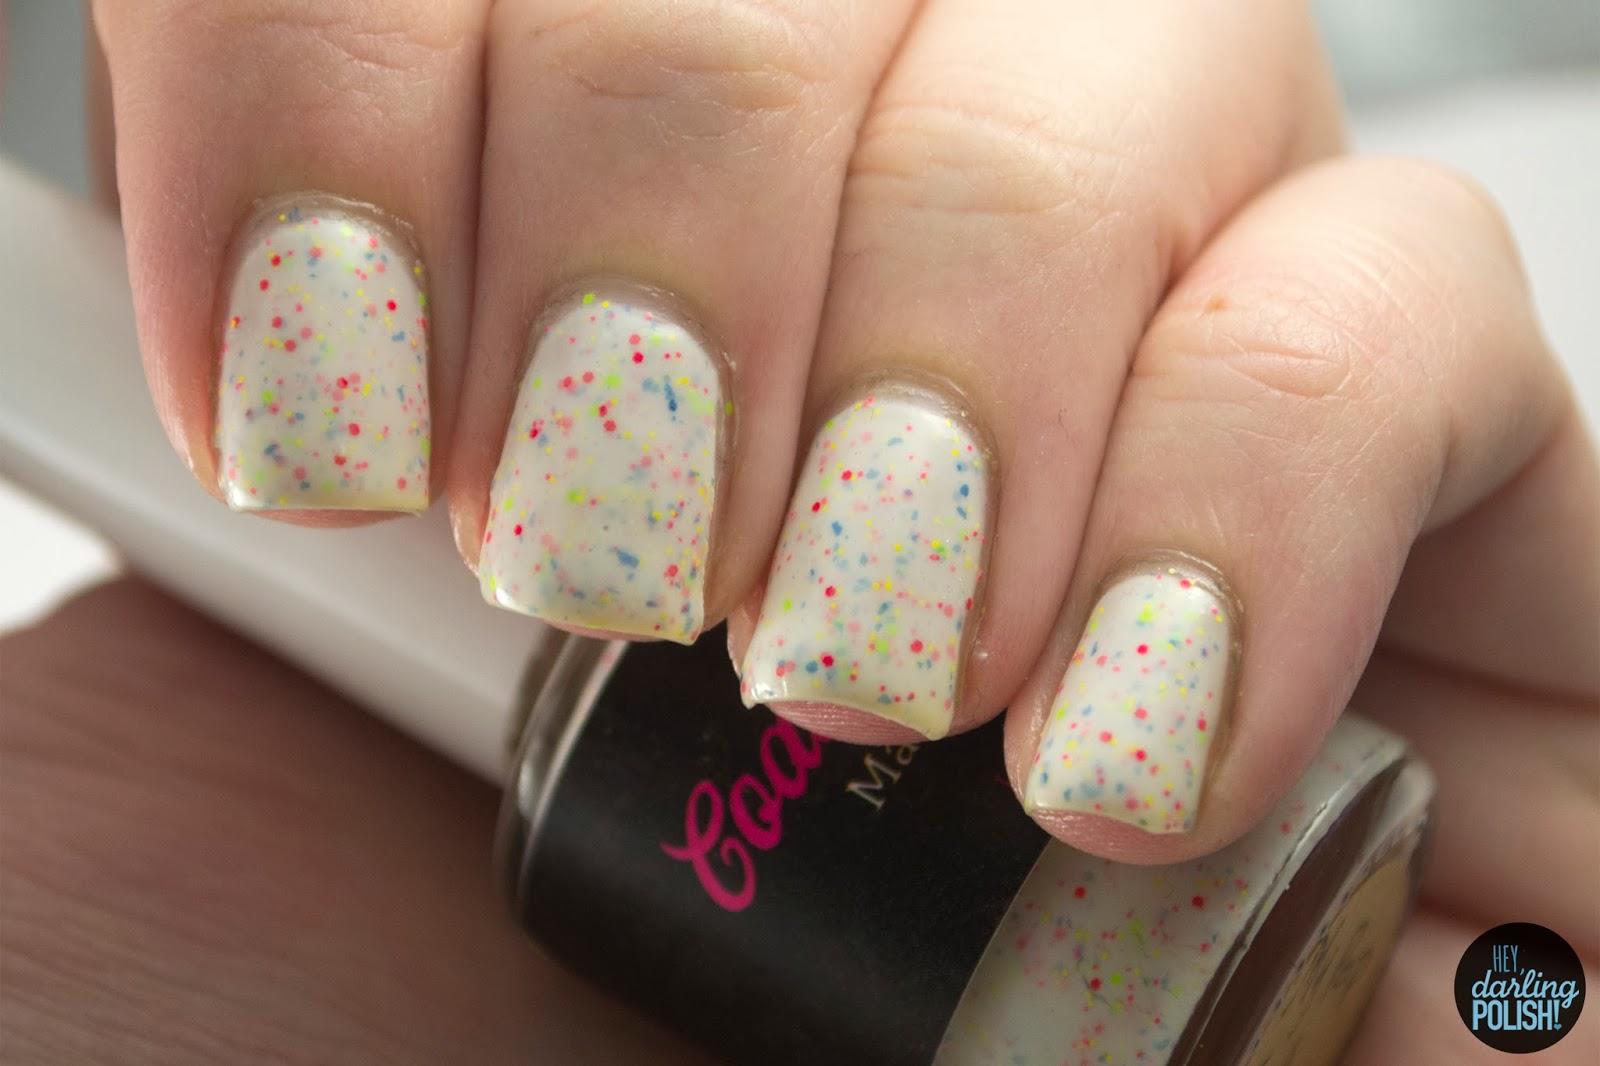 nails, nail polish, polish, indie, indie polish, coated in polish, hey darling polish, my pop tart melted, white